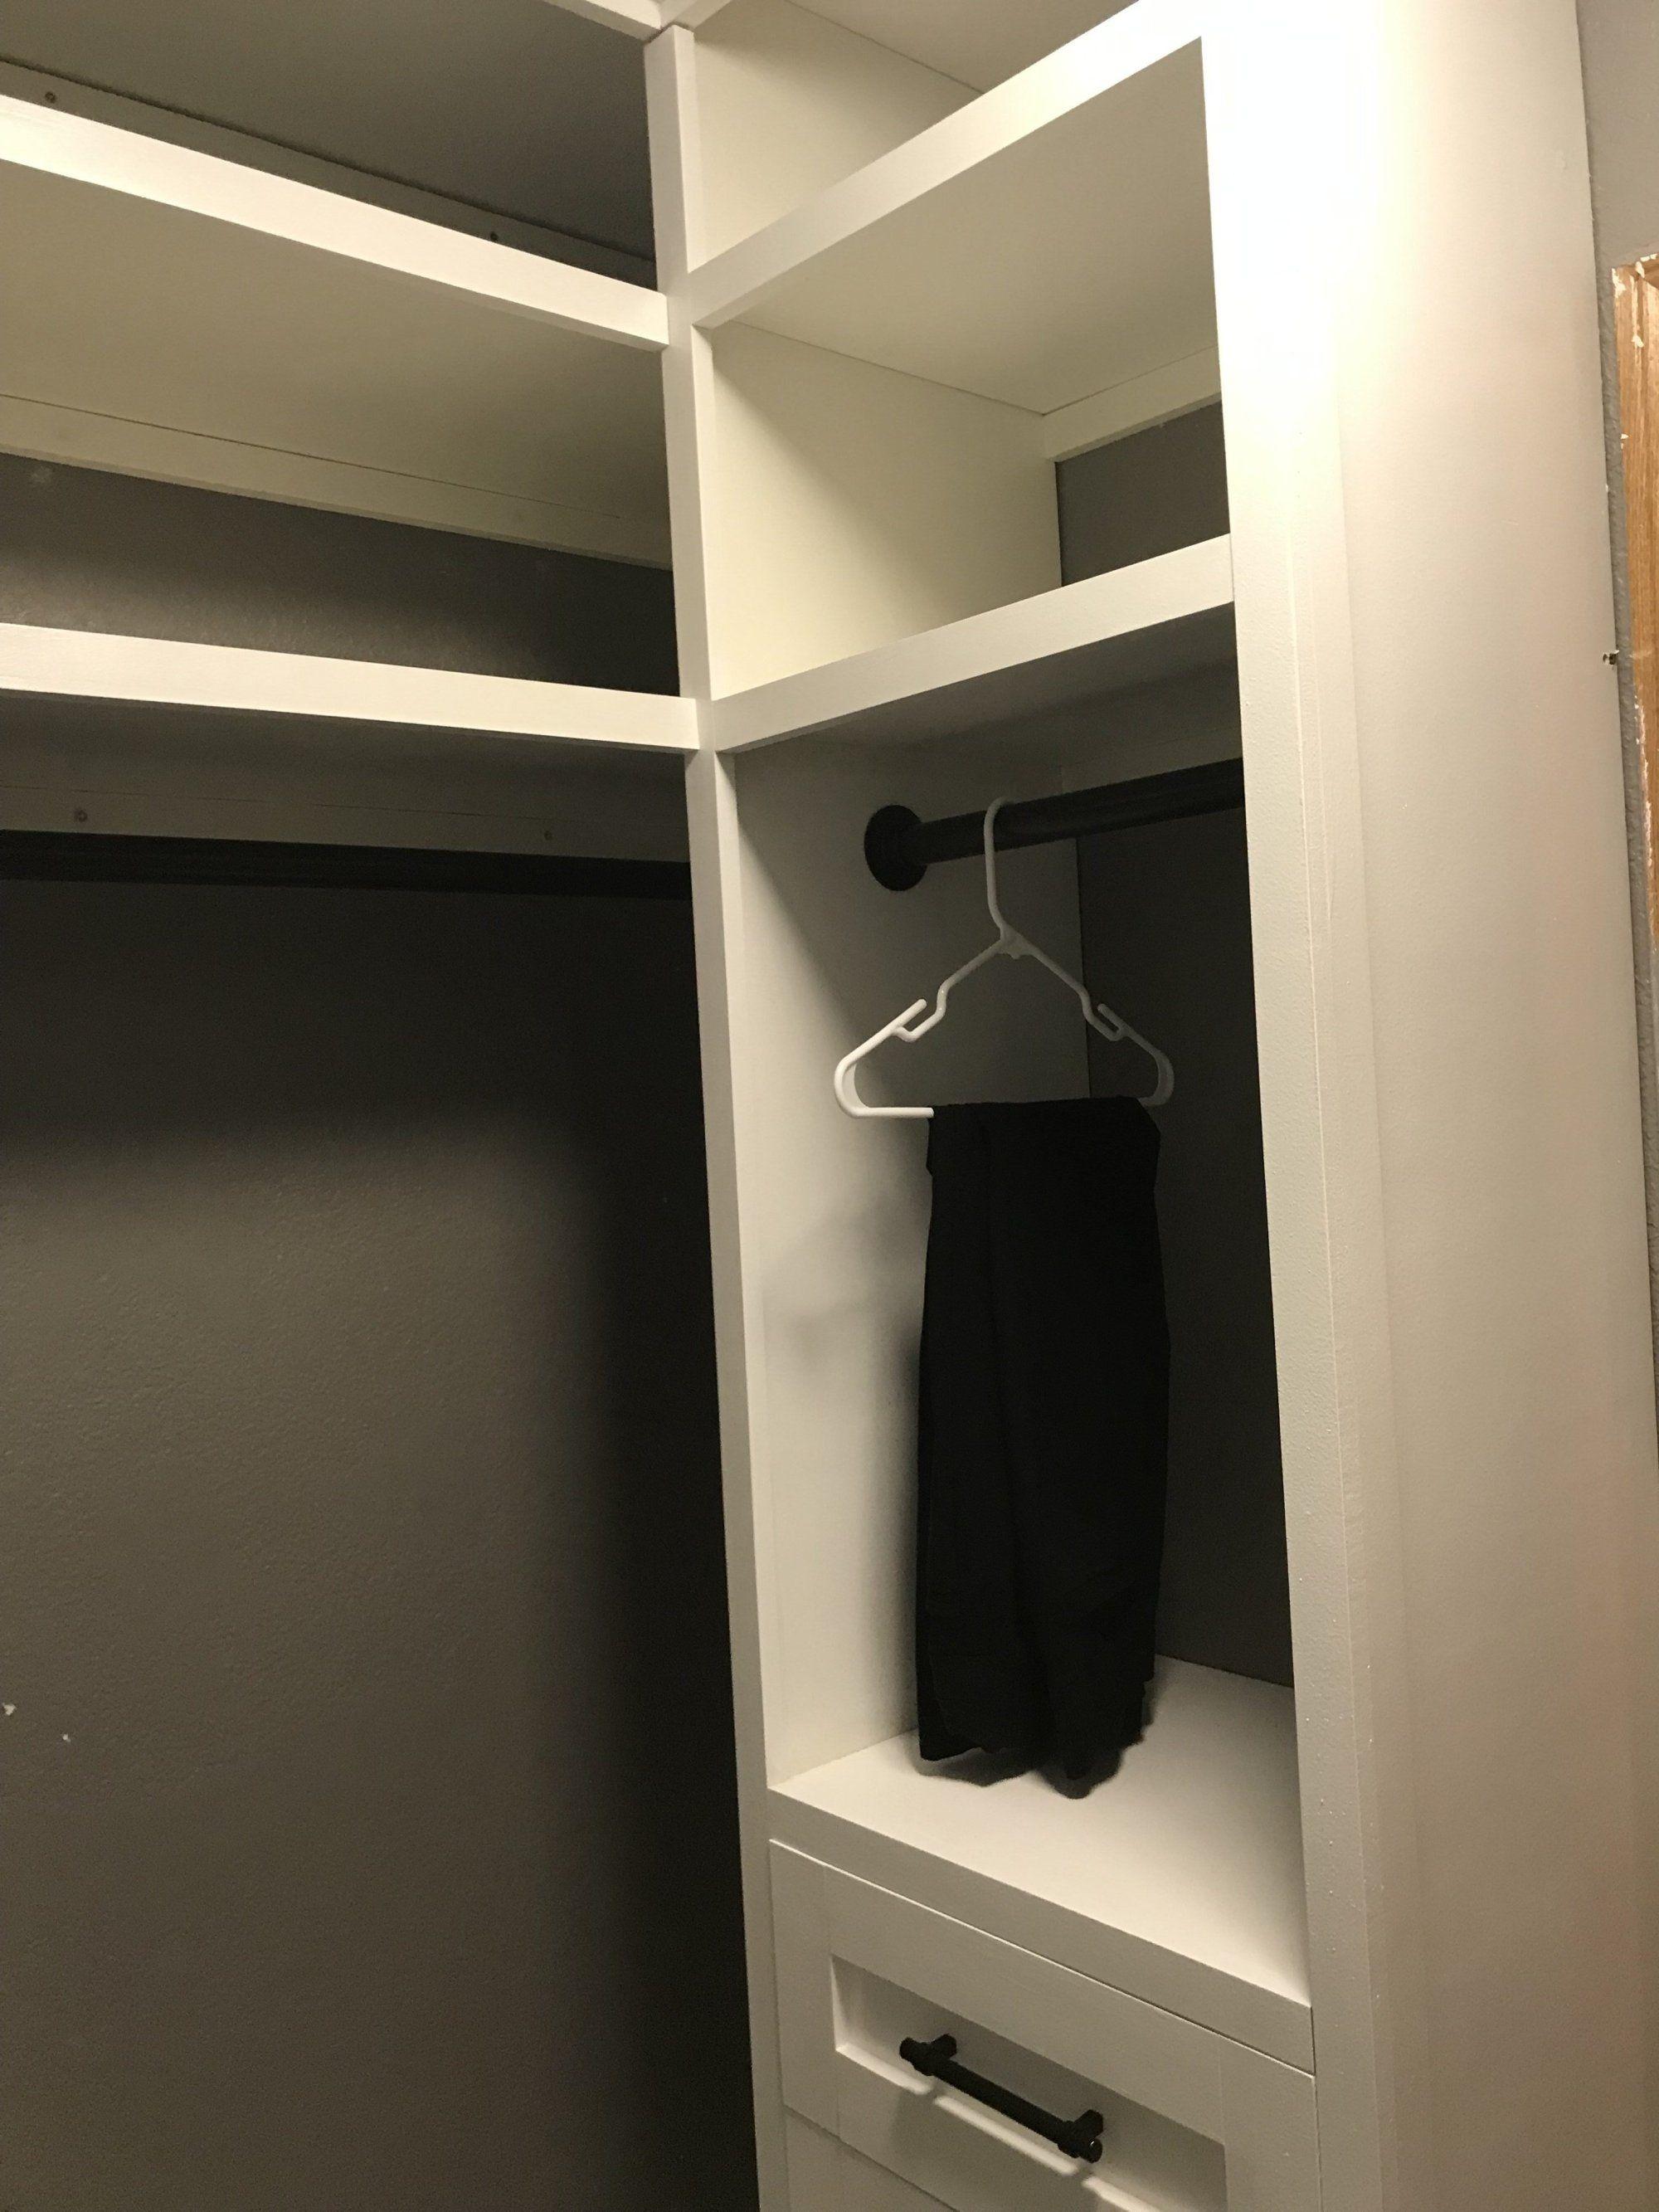 Diy Closet Organizer Built In Closet Organization Closet Organization Diy Build A Closet Closet Makeover Diy